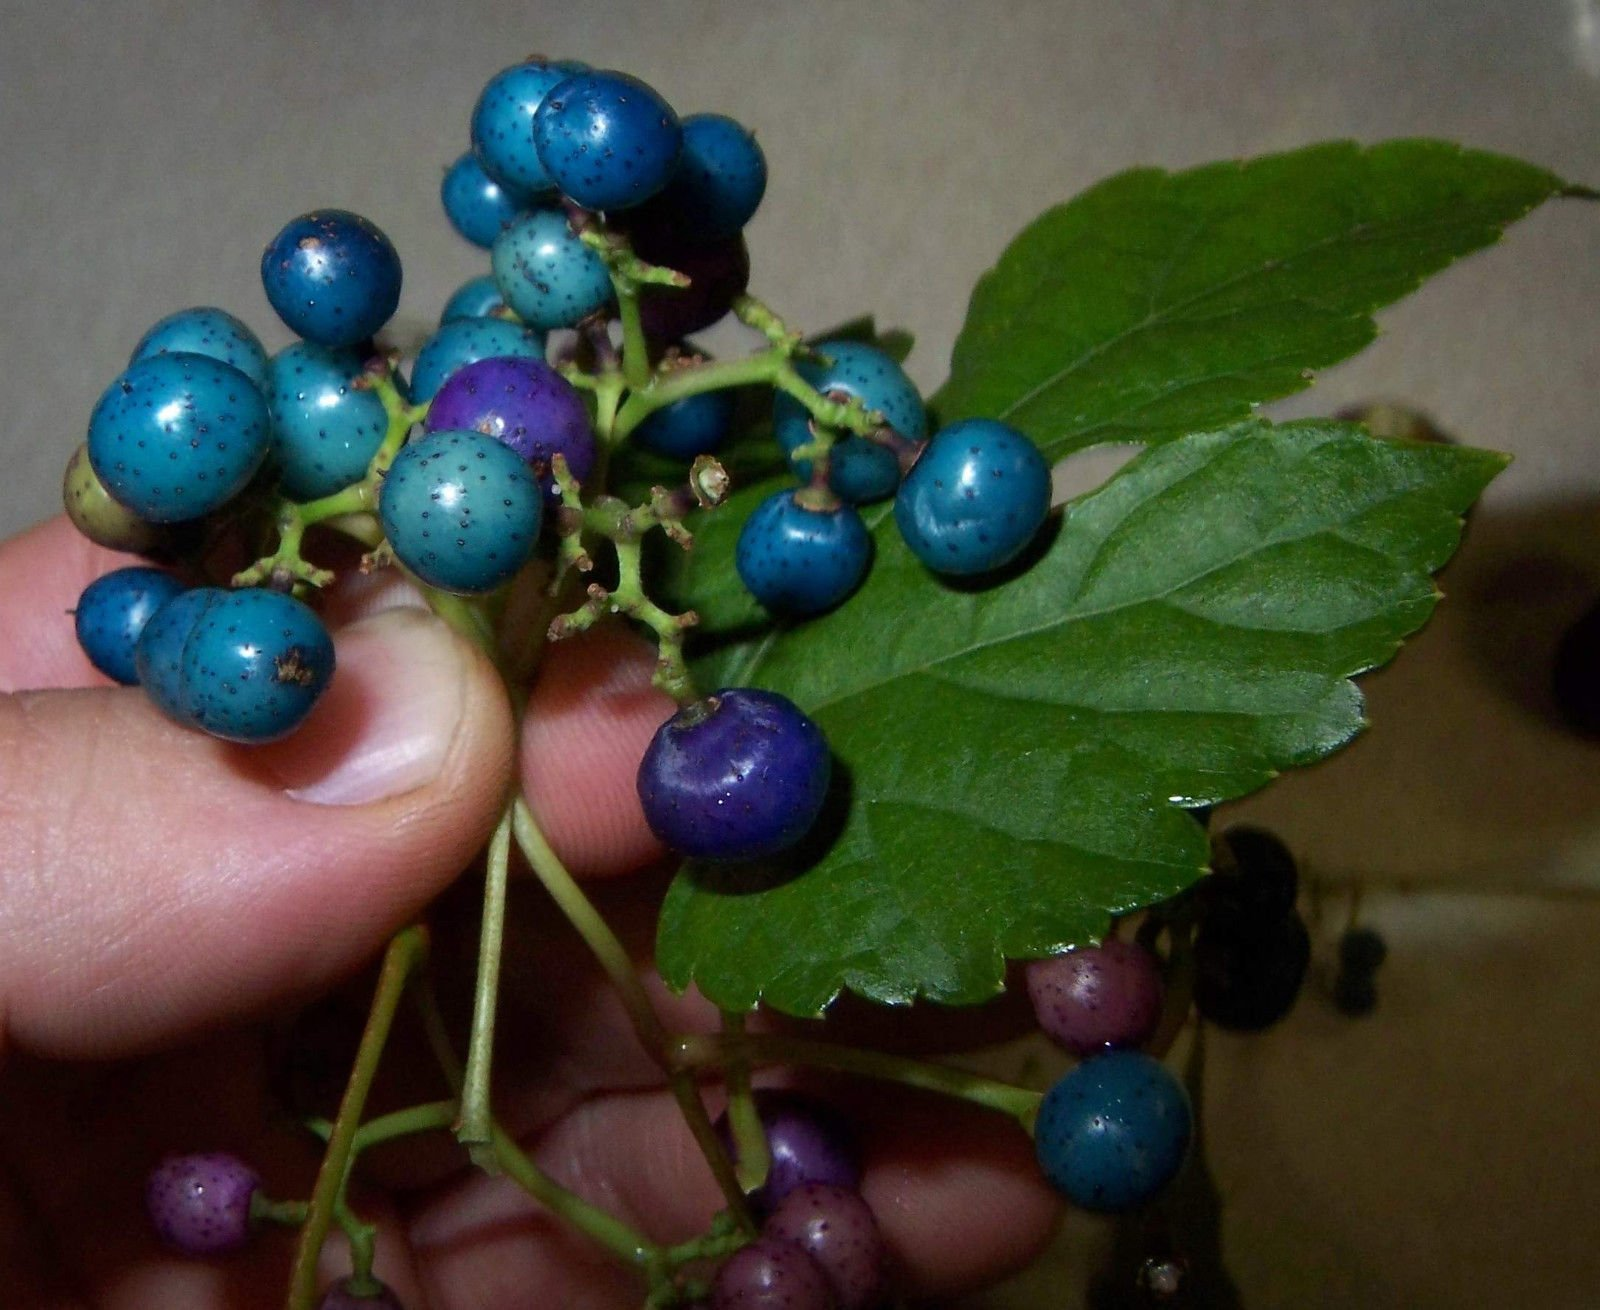 Porcelaine grape berry vine seeds, Ampelopsis, hardy liana, blue rare berries